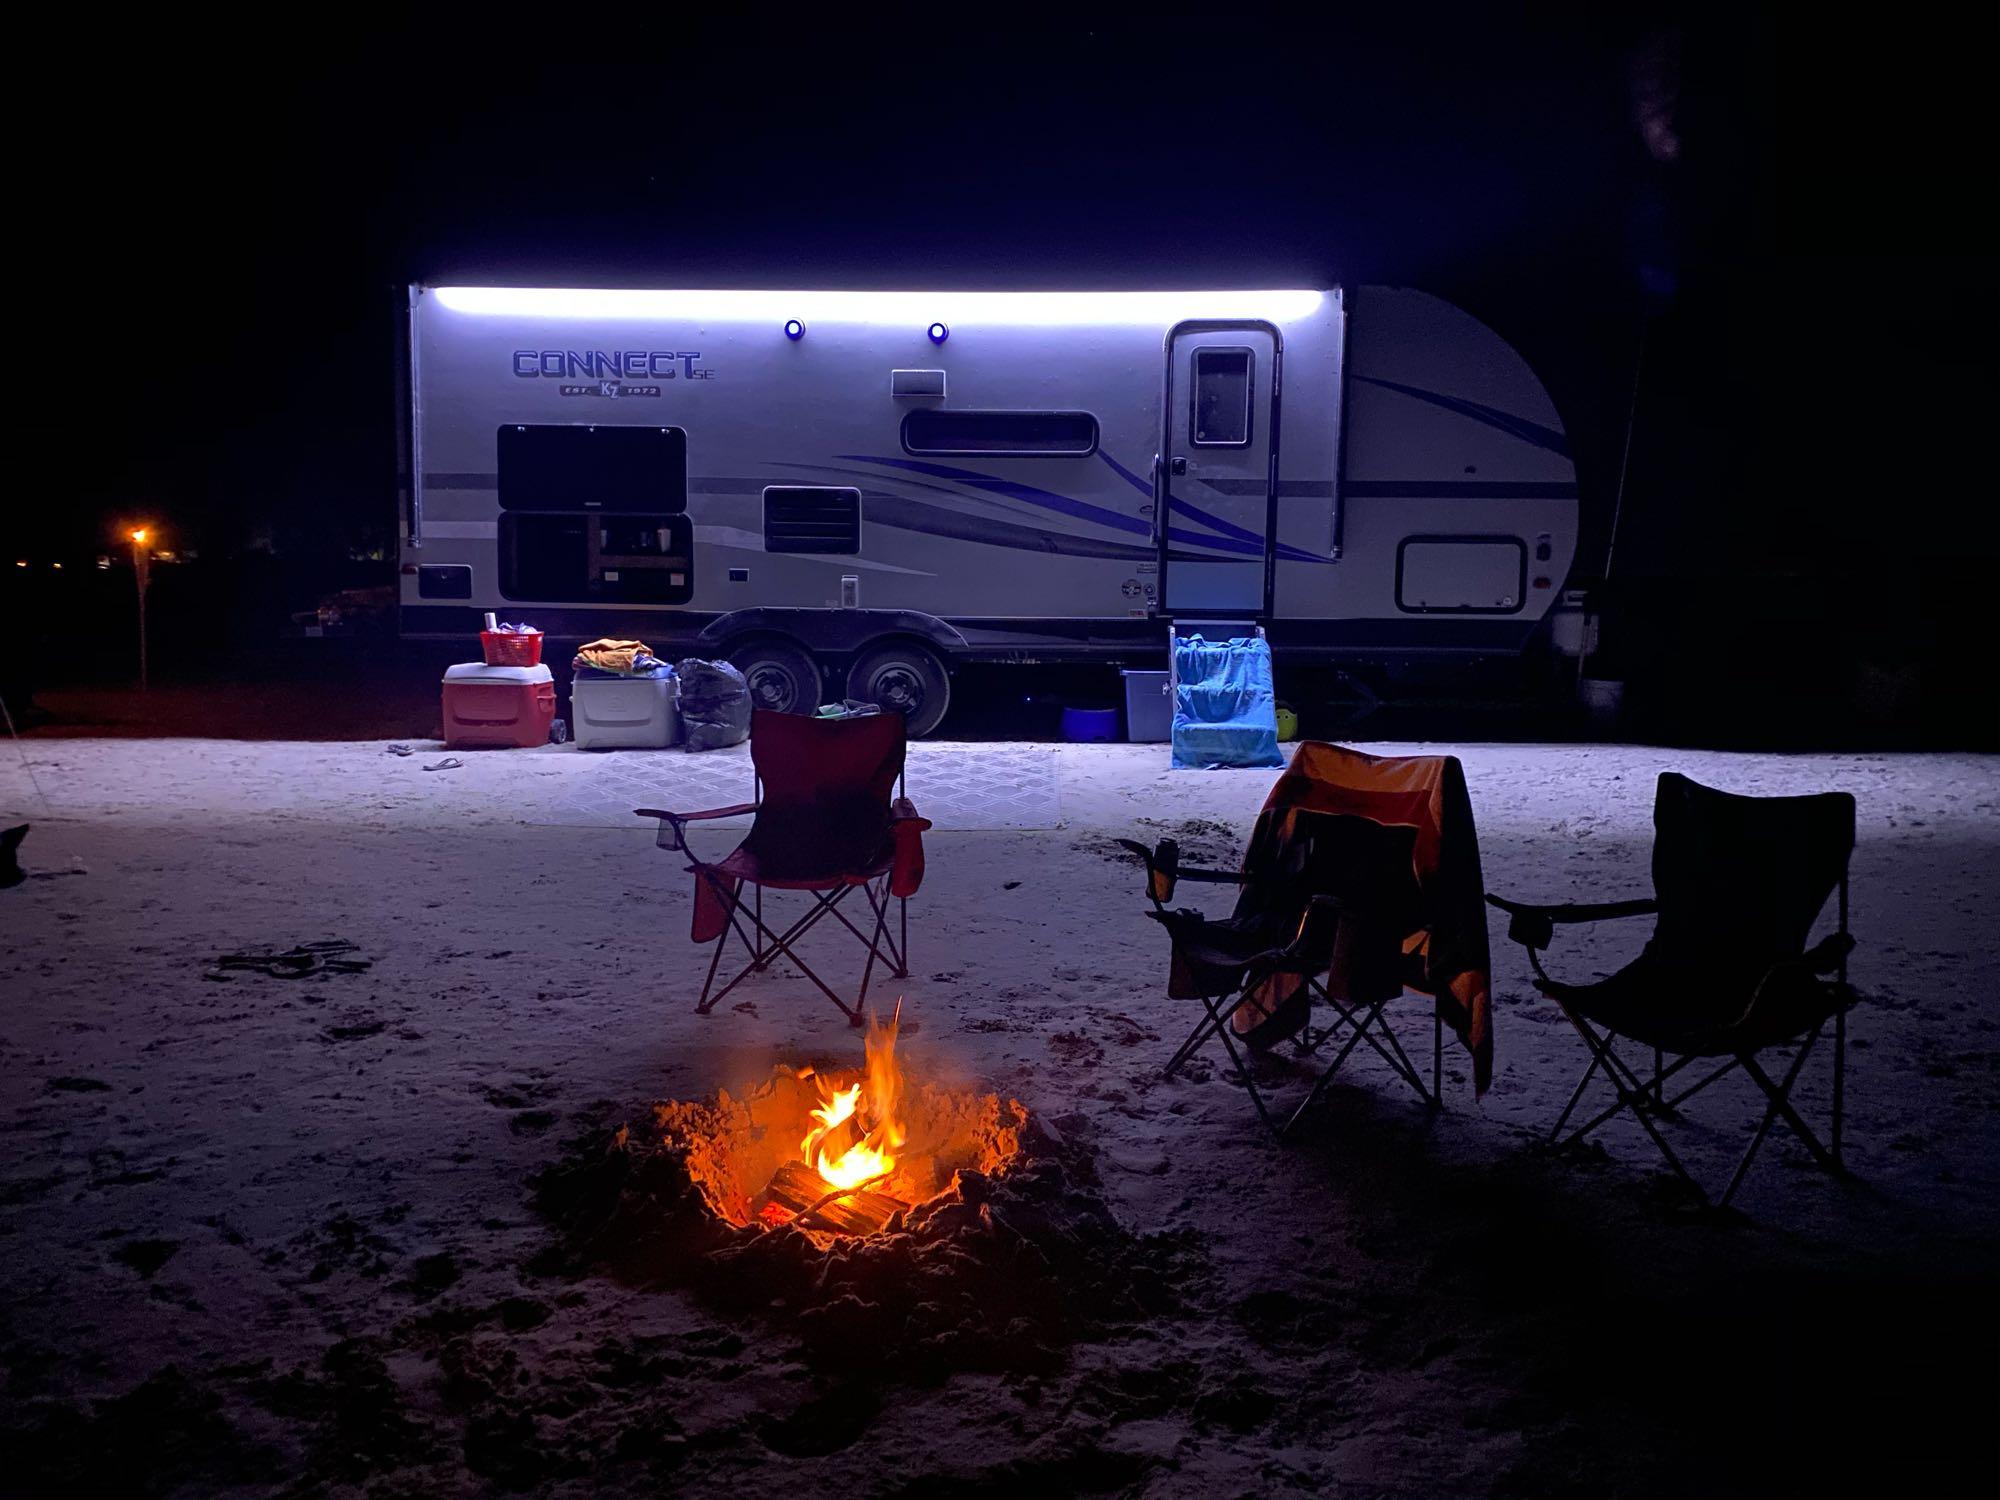 Beautiful night at Lake McConaughy. K-Z Connect SE C231BHKSE 2020